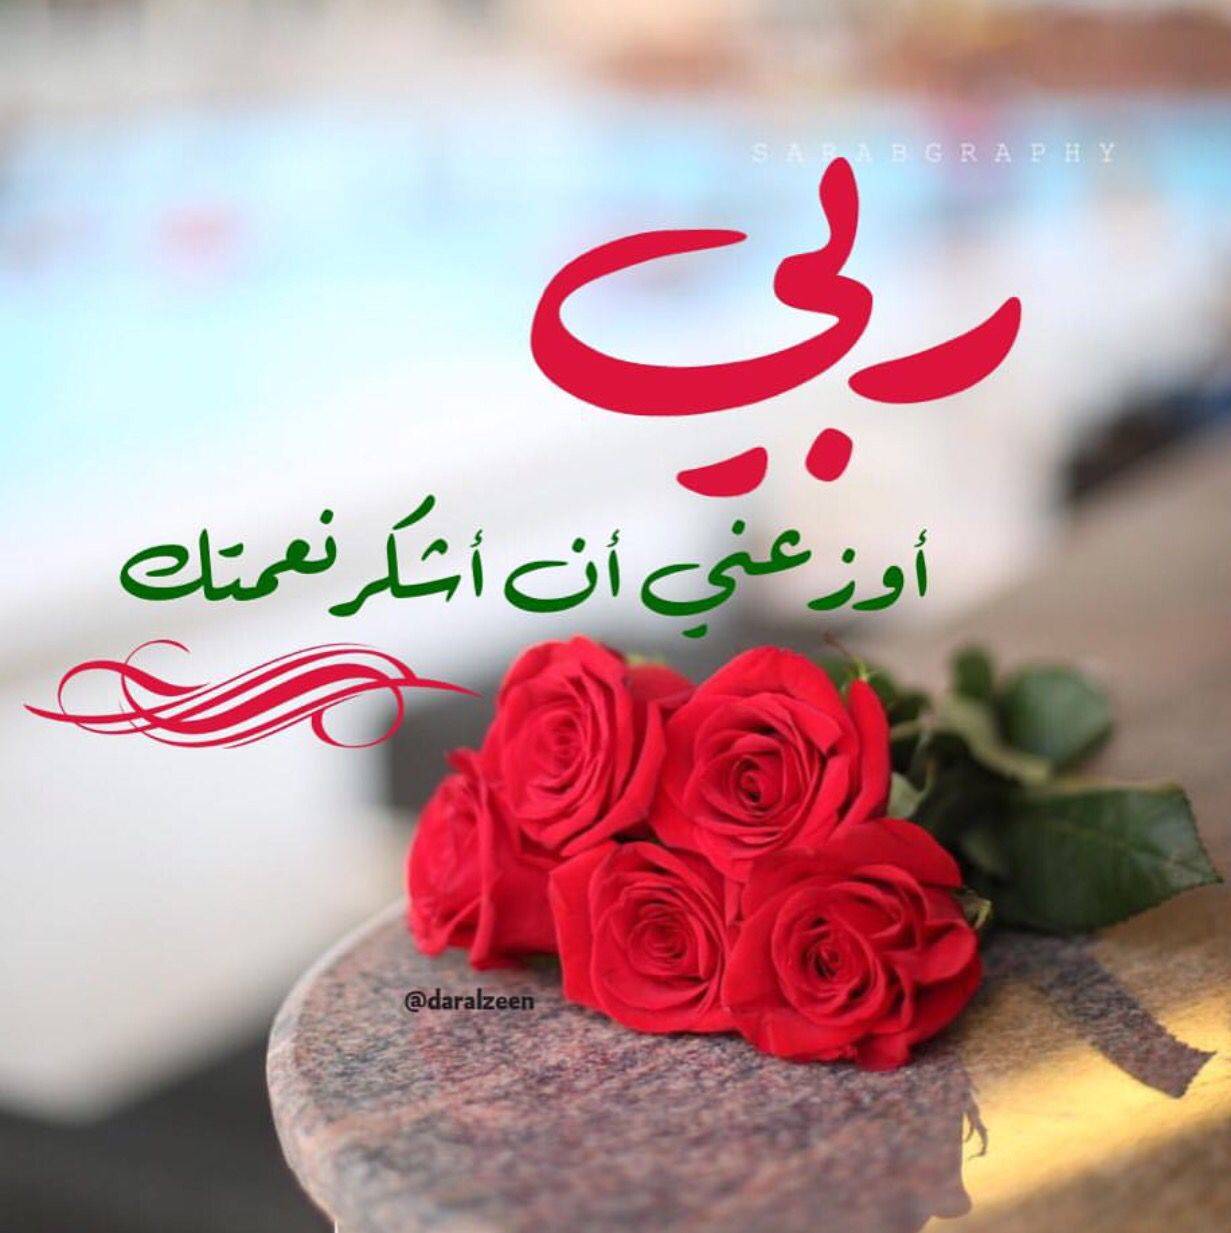 Pin By Daralzeen On رمزيات اسلاميه Islam Facts Allah Love Islamic Pictures